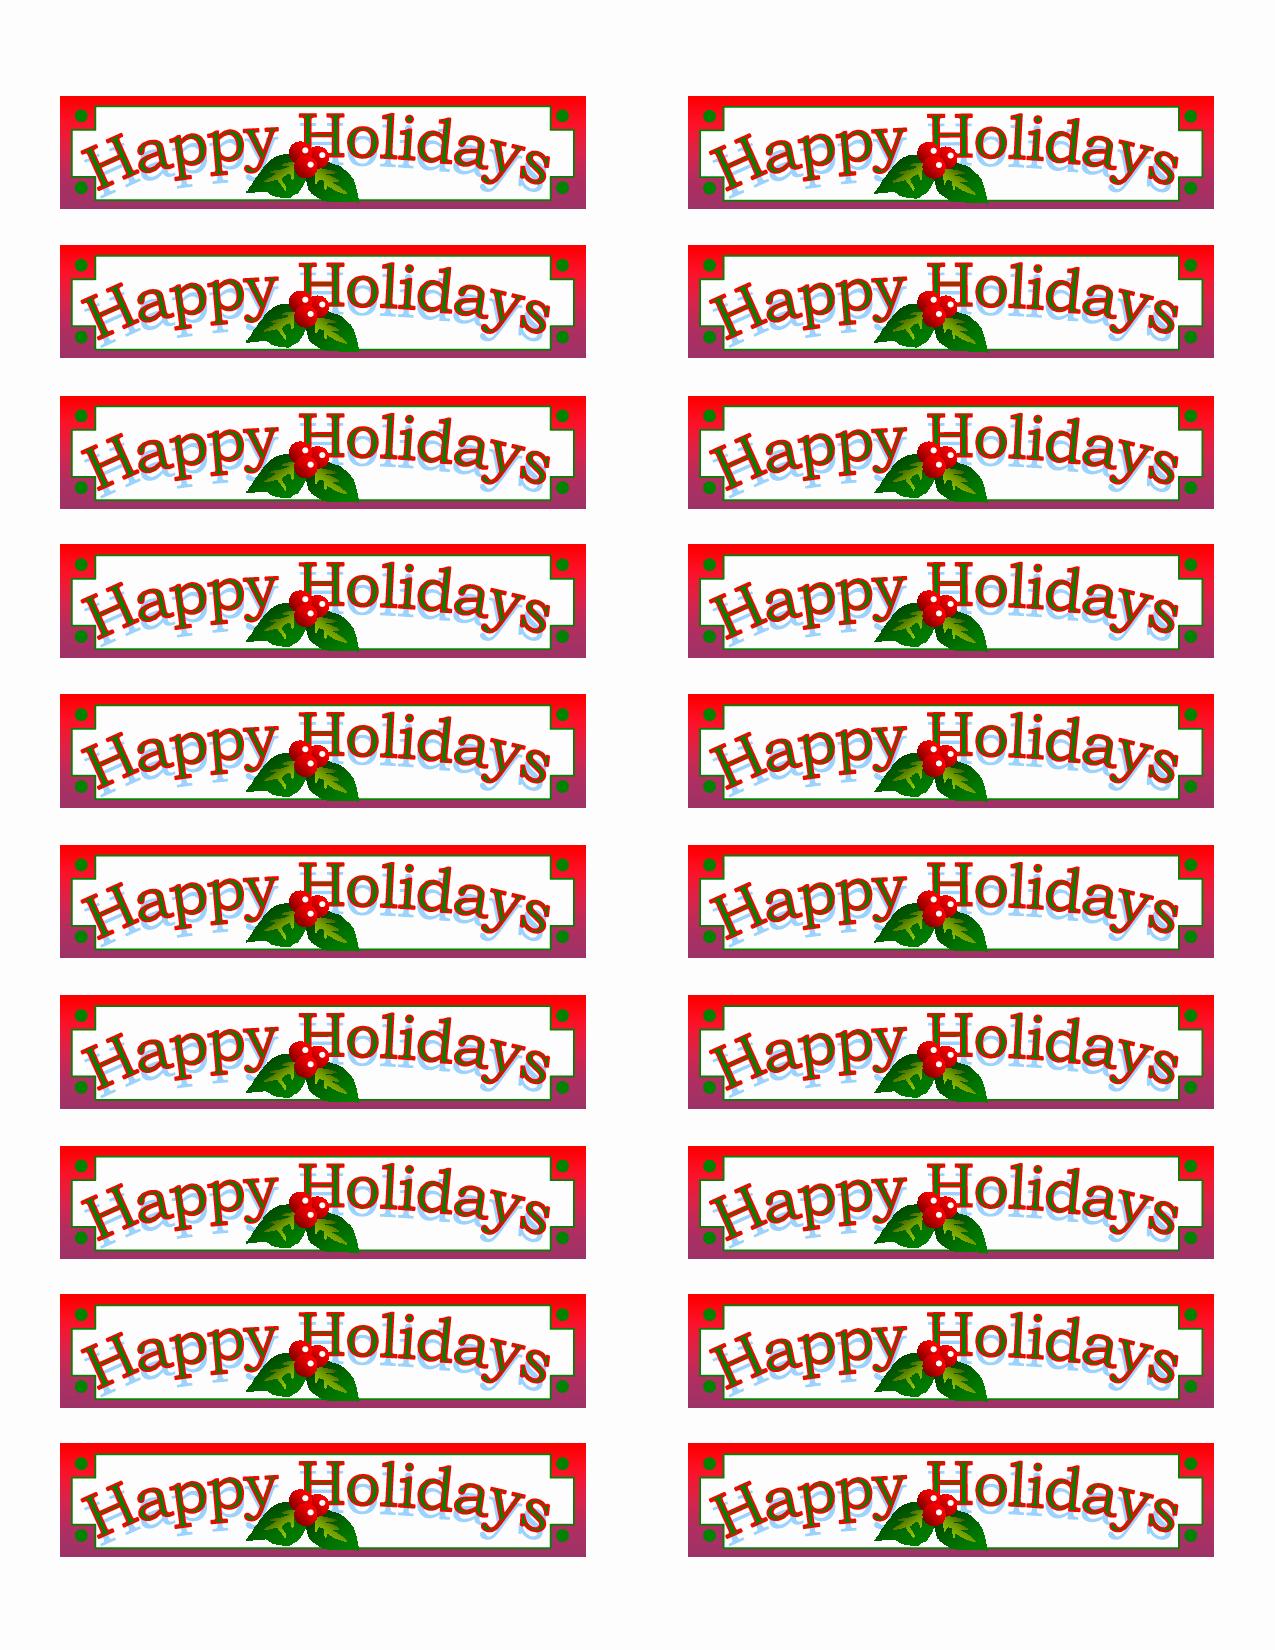 Avery Return Address Labels 5160 Elegant Christmas Return Address Labels Template Avery 5160 top